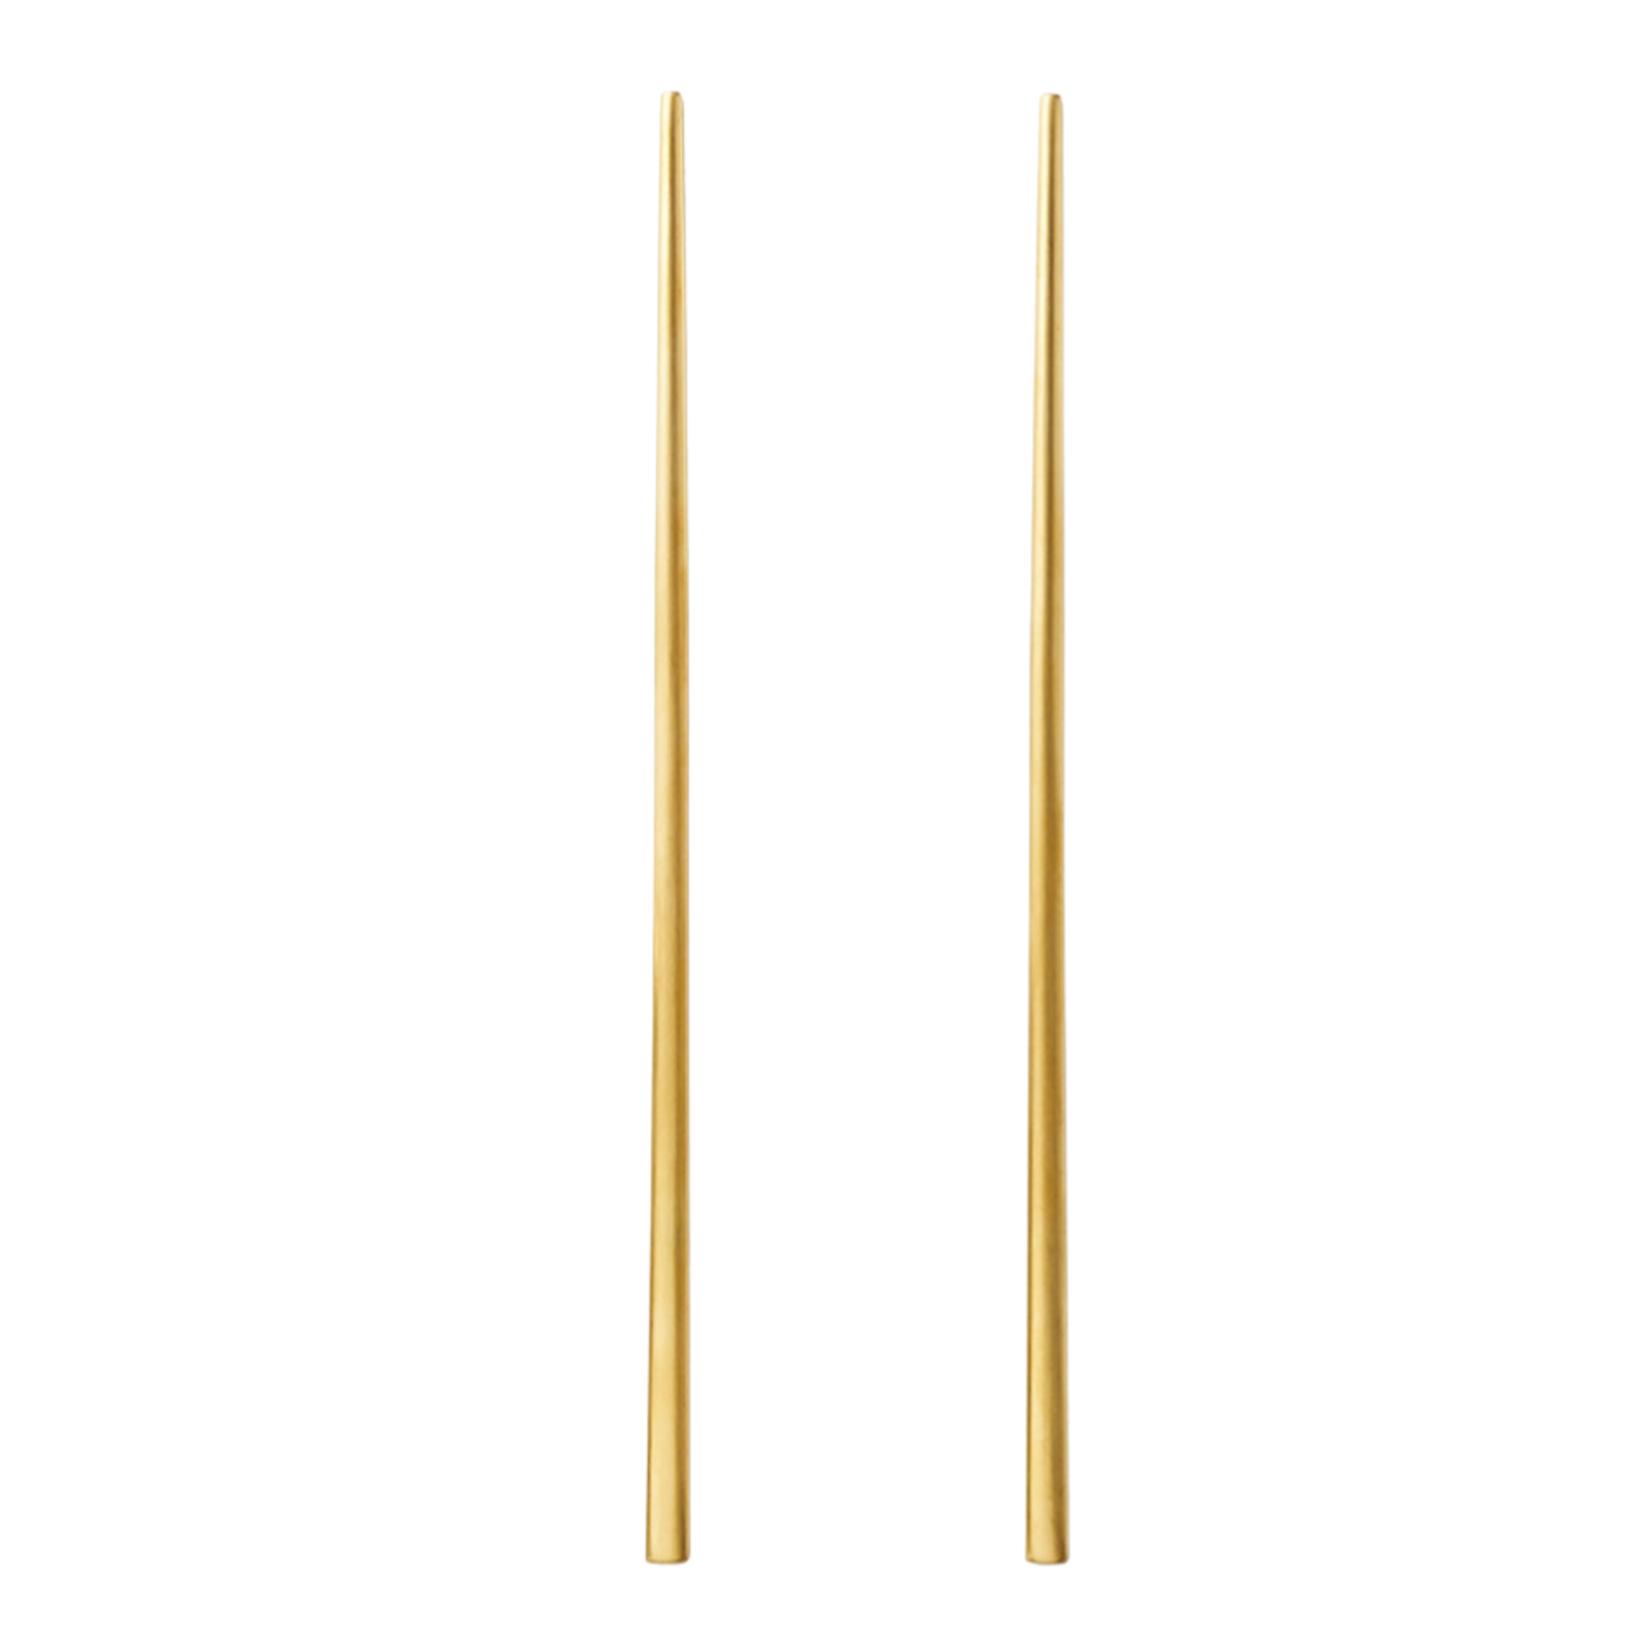 Wyld Blue Home Gold Chopsticks